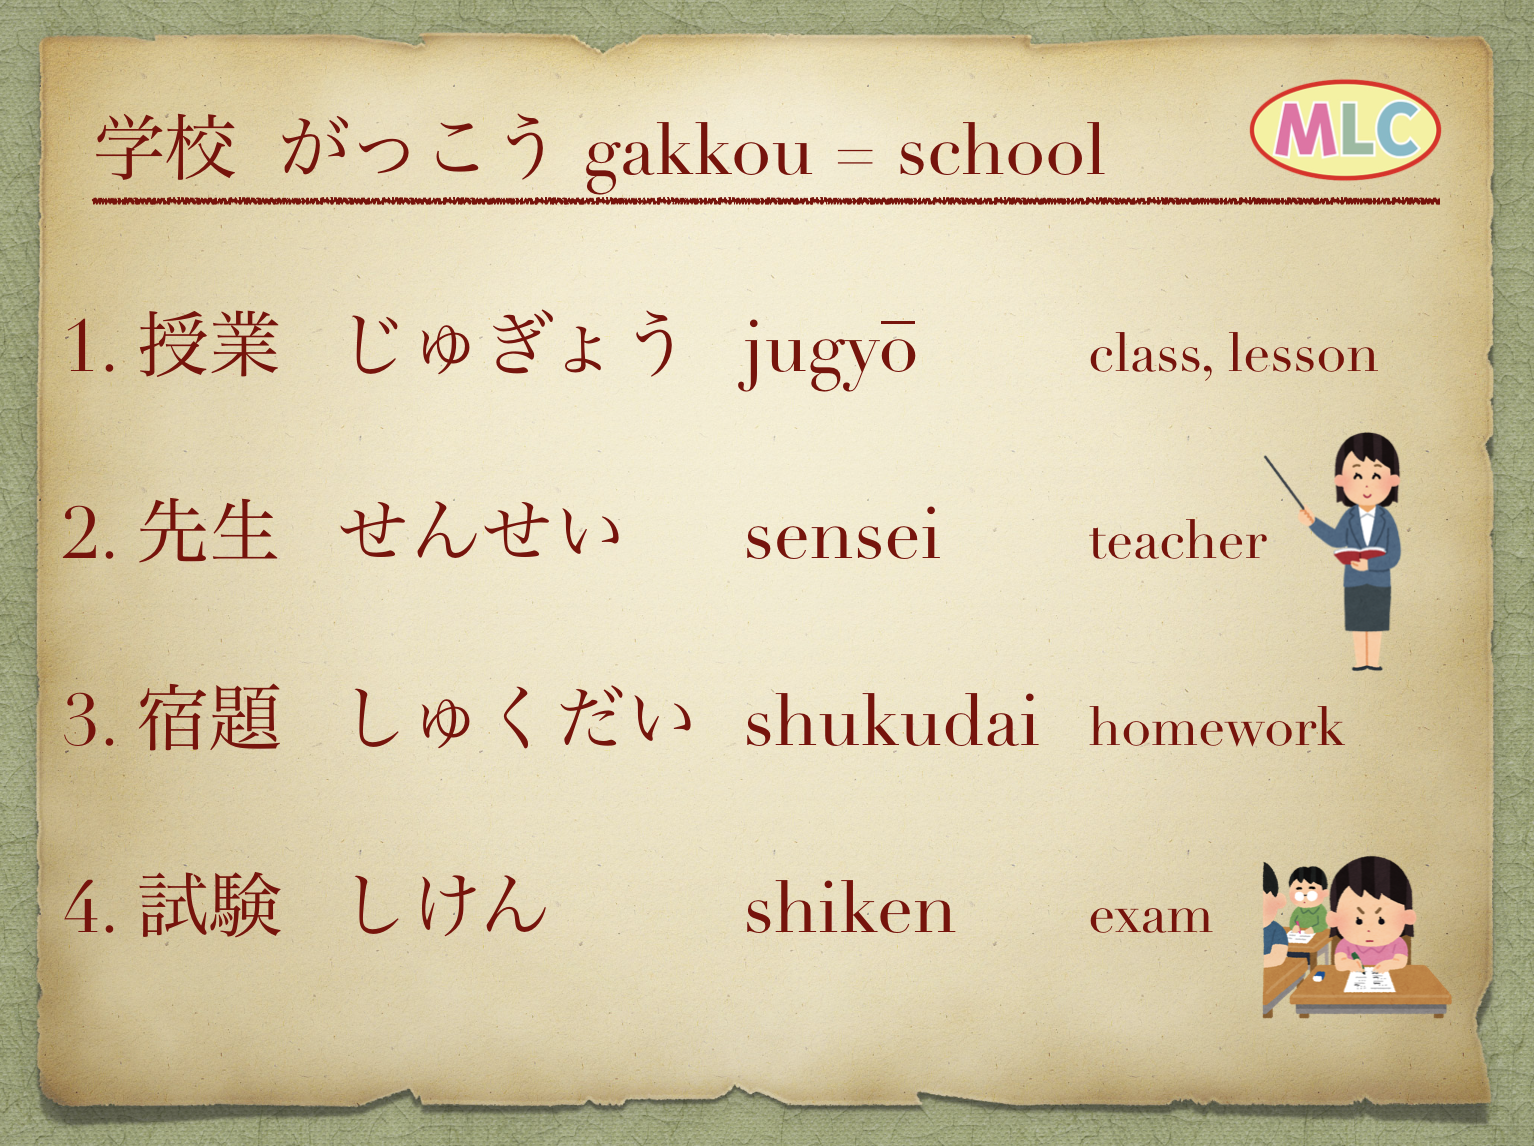 Gakkou School